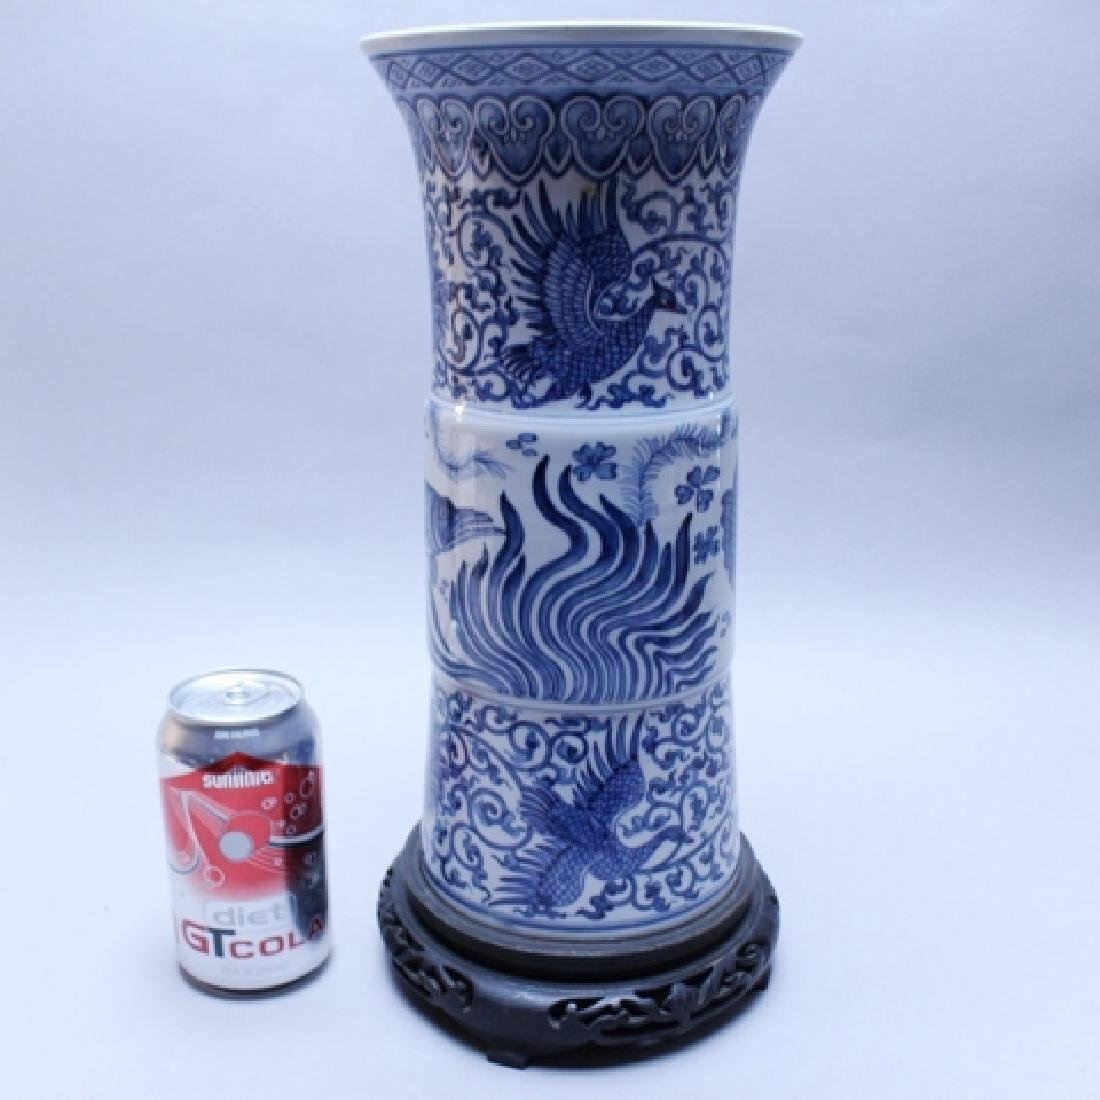 Decorative Blue and White Porcelain Gu Vase - 9